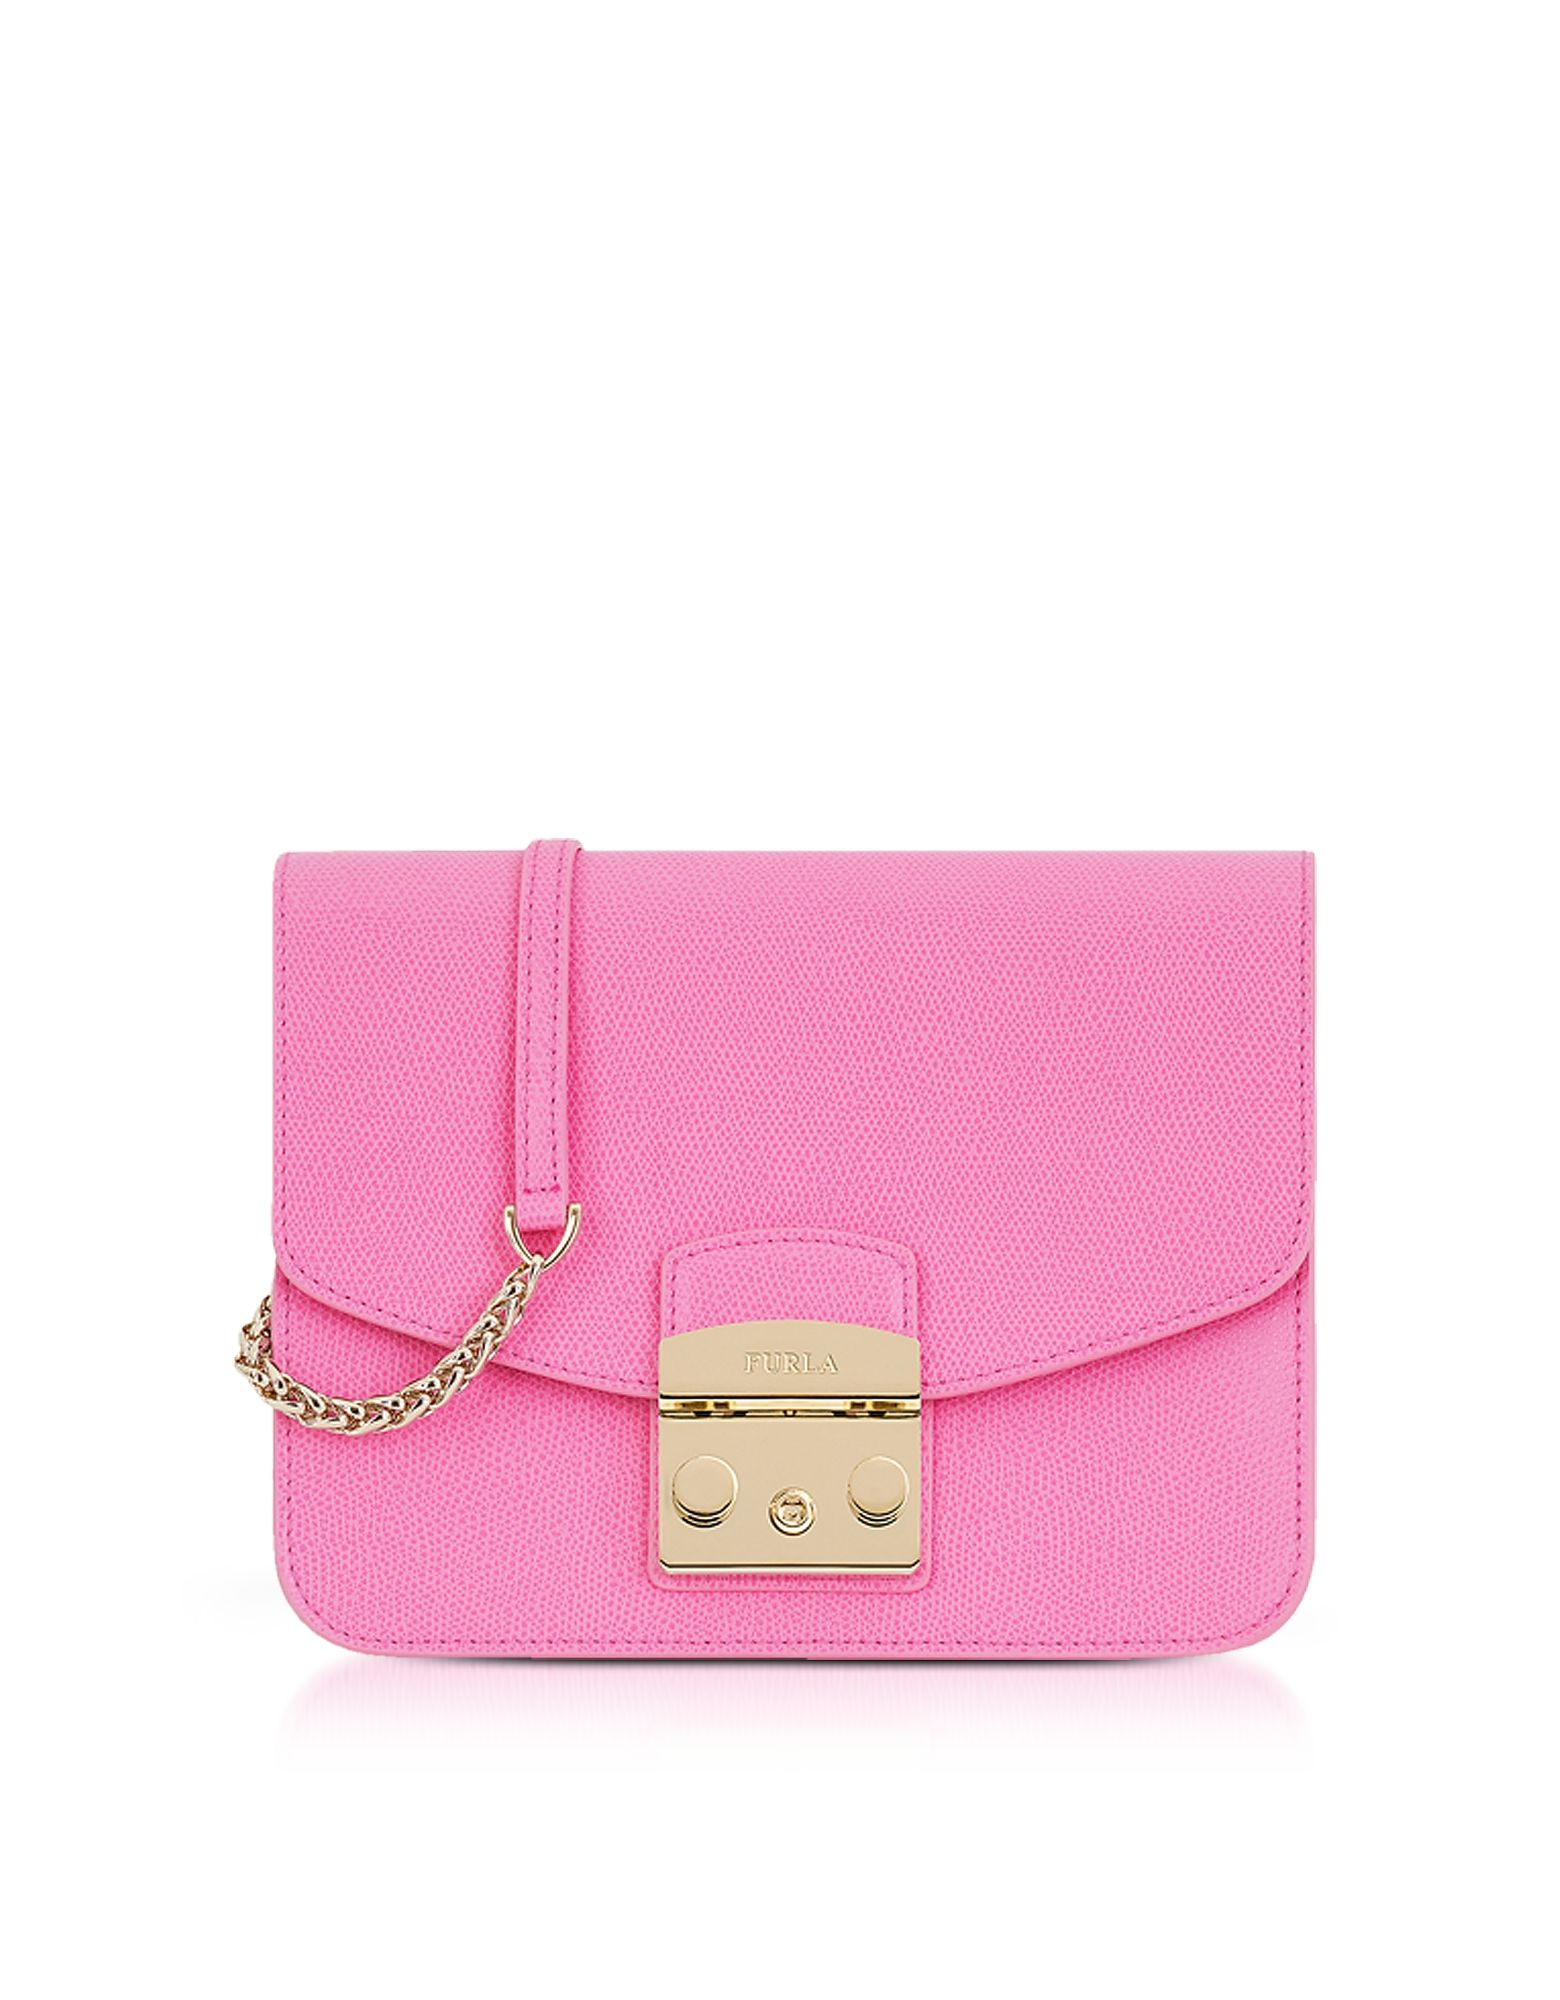 Furla Handbags, Orchid Leather Metropolis Small Shoulder Bag